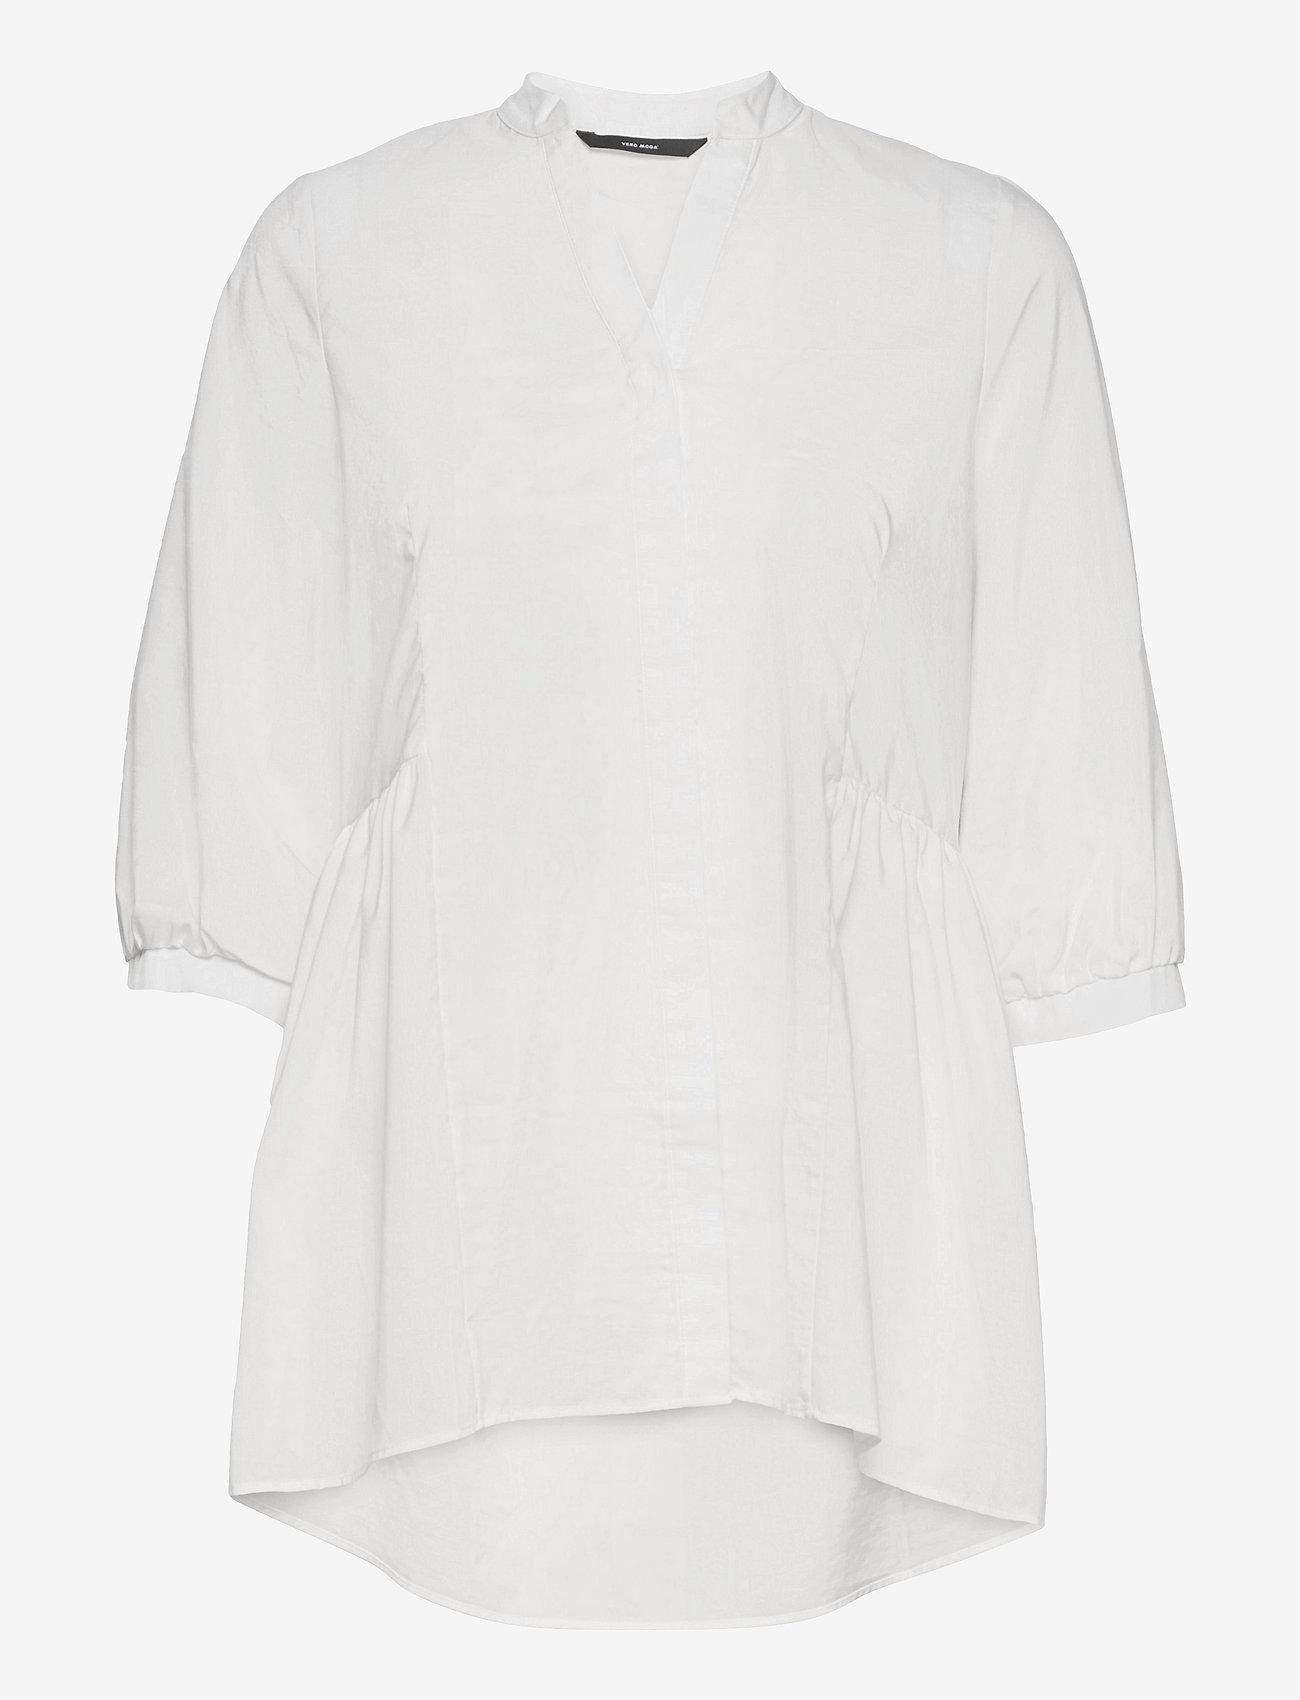 Vero Moda - VMCLARA 3/4 LONG SHIRT - långärmade skjortor - snow white - 0